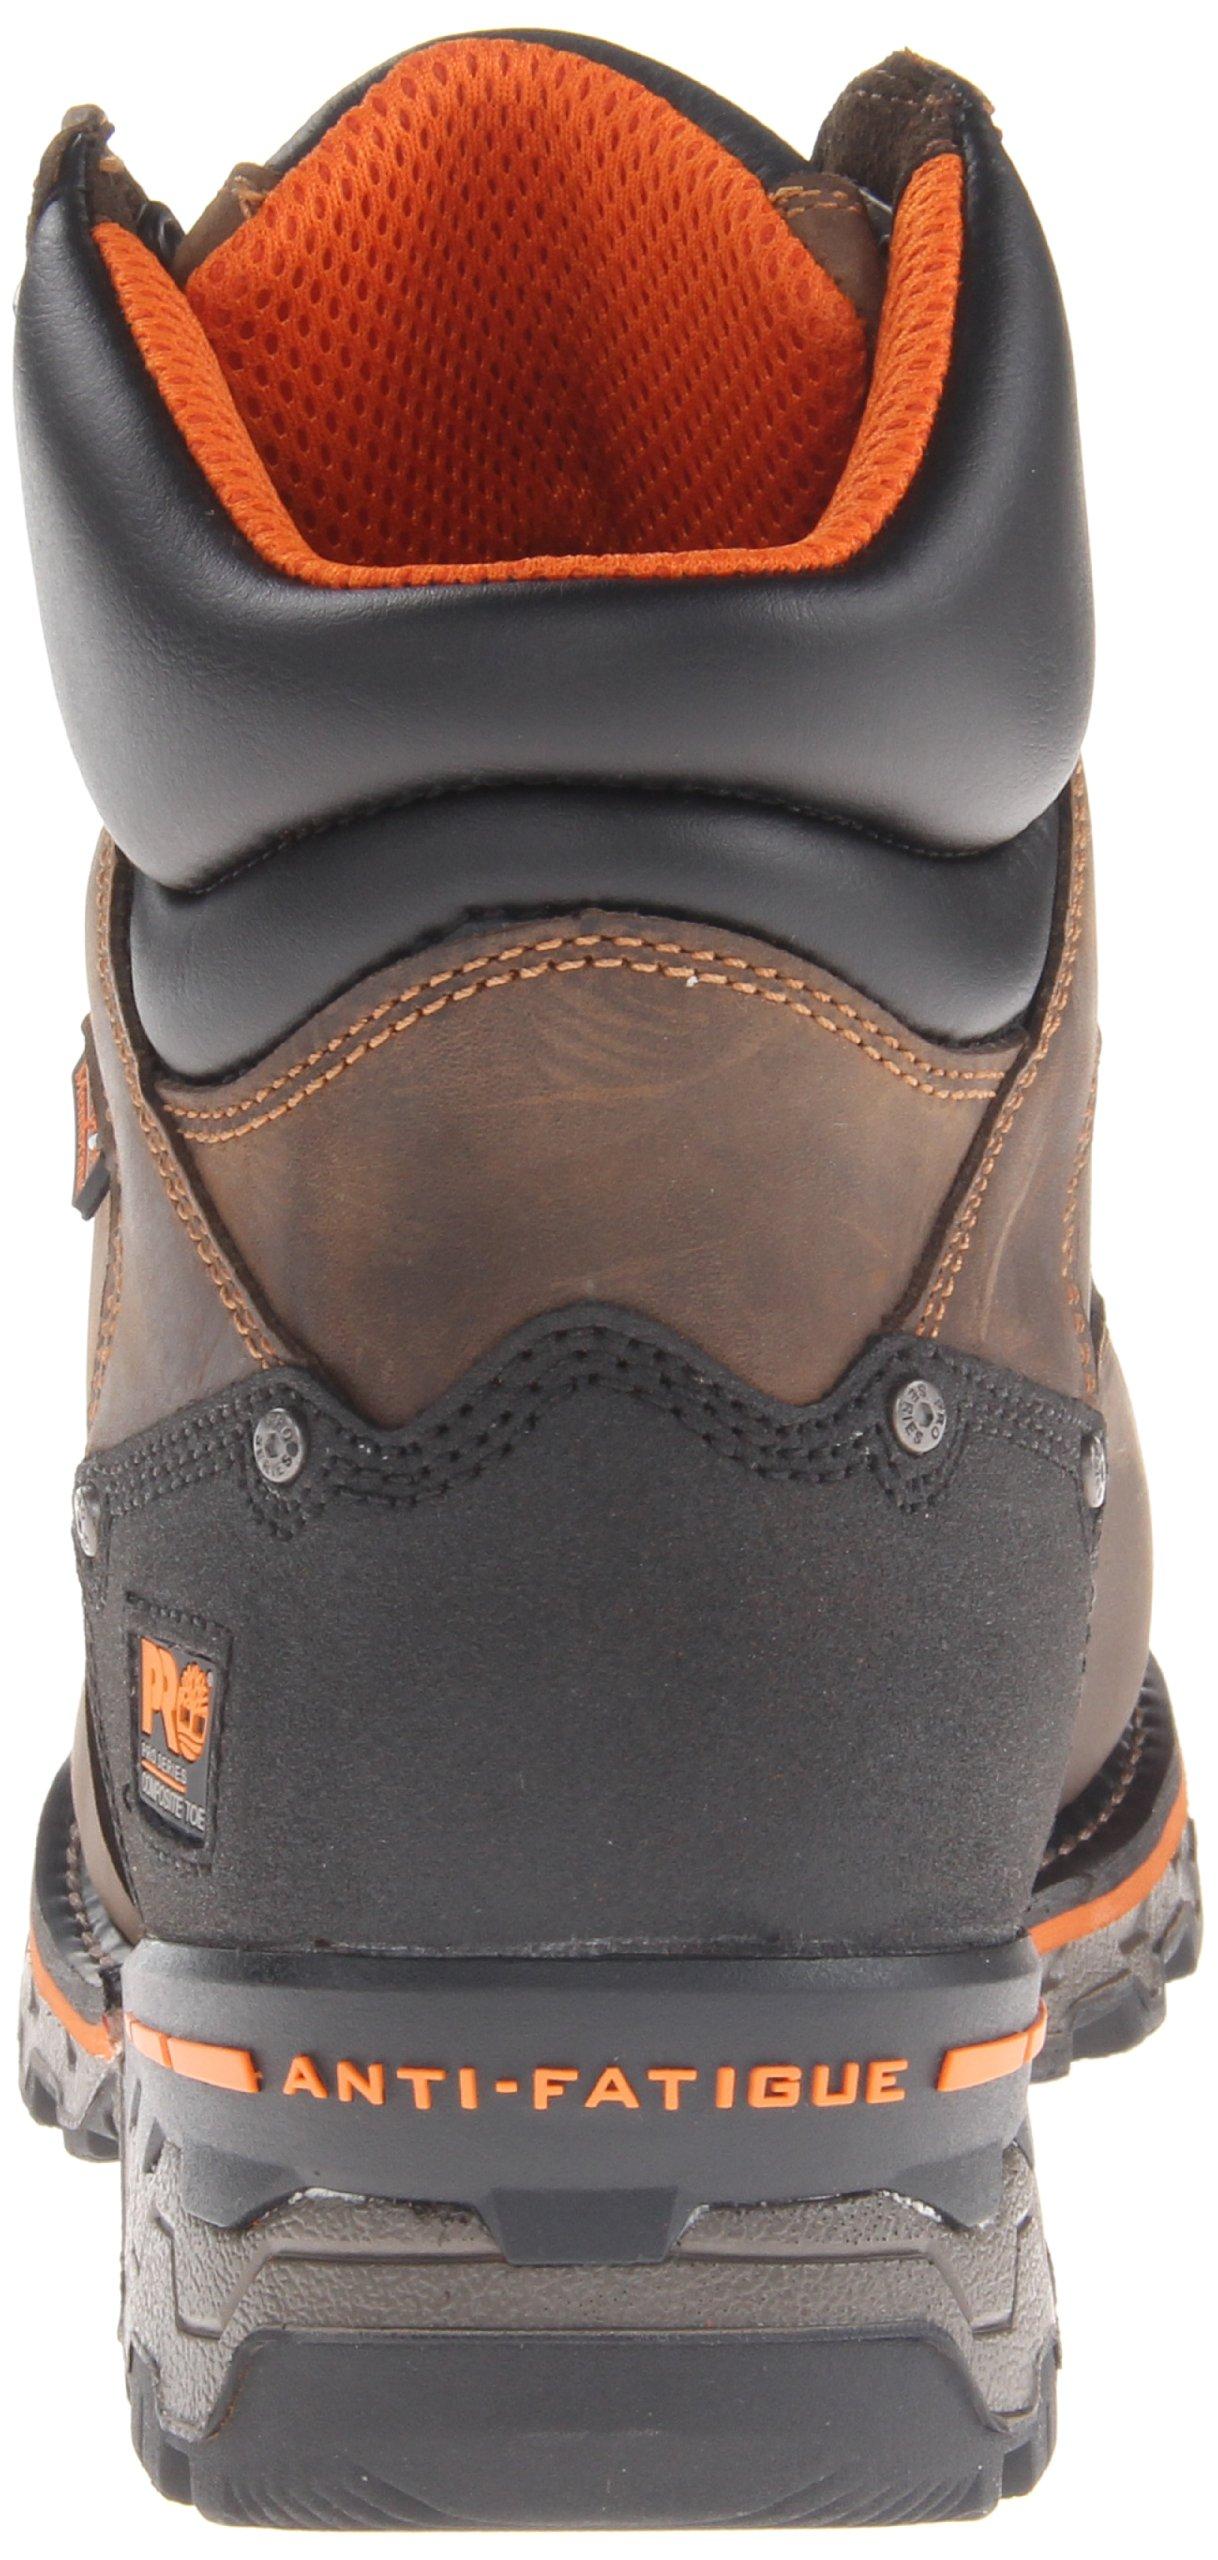 87e443d8748d Timberland PRO Men s Boondock 6 Inch Waterproof Non-Insulated Work  Boot